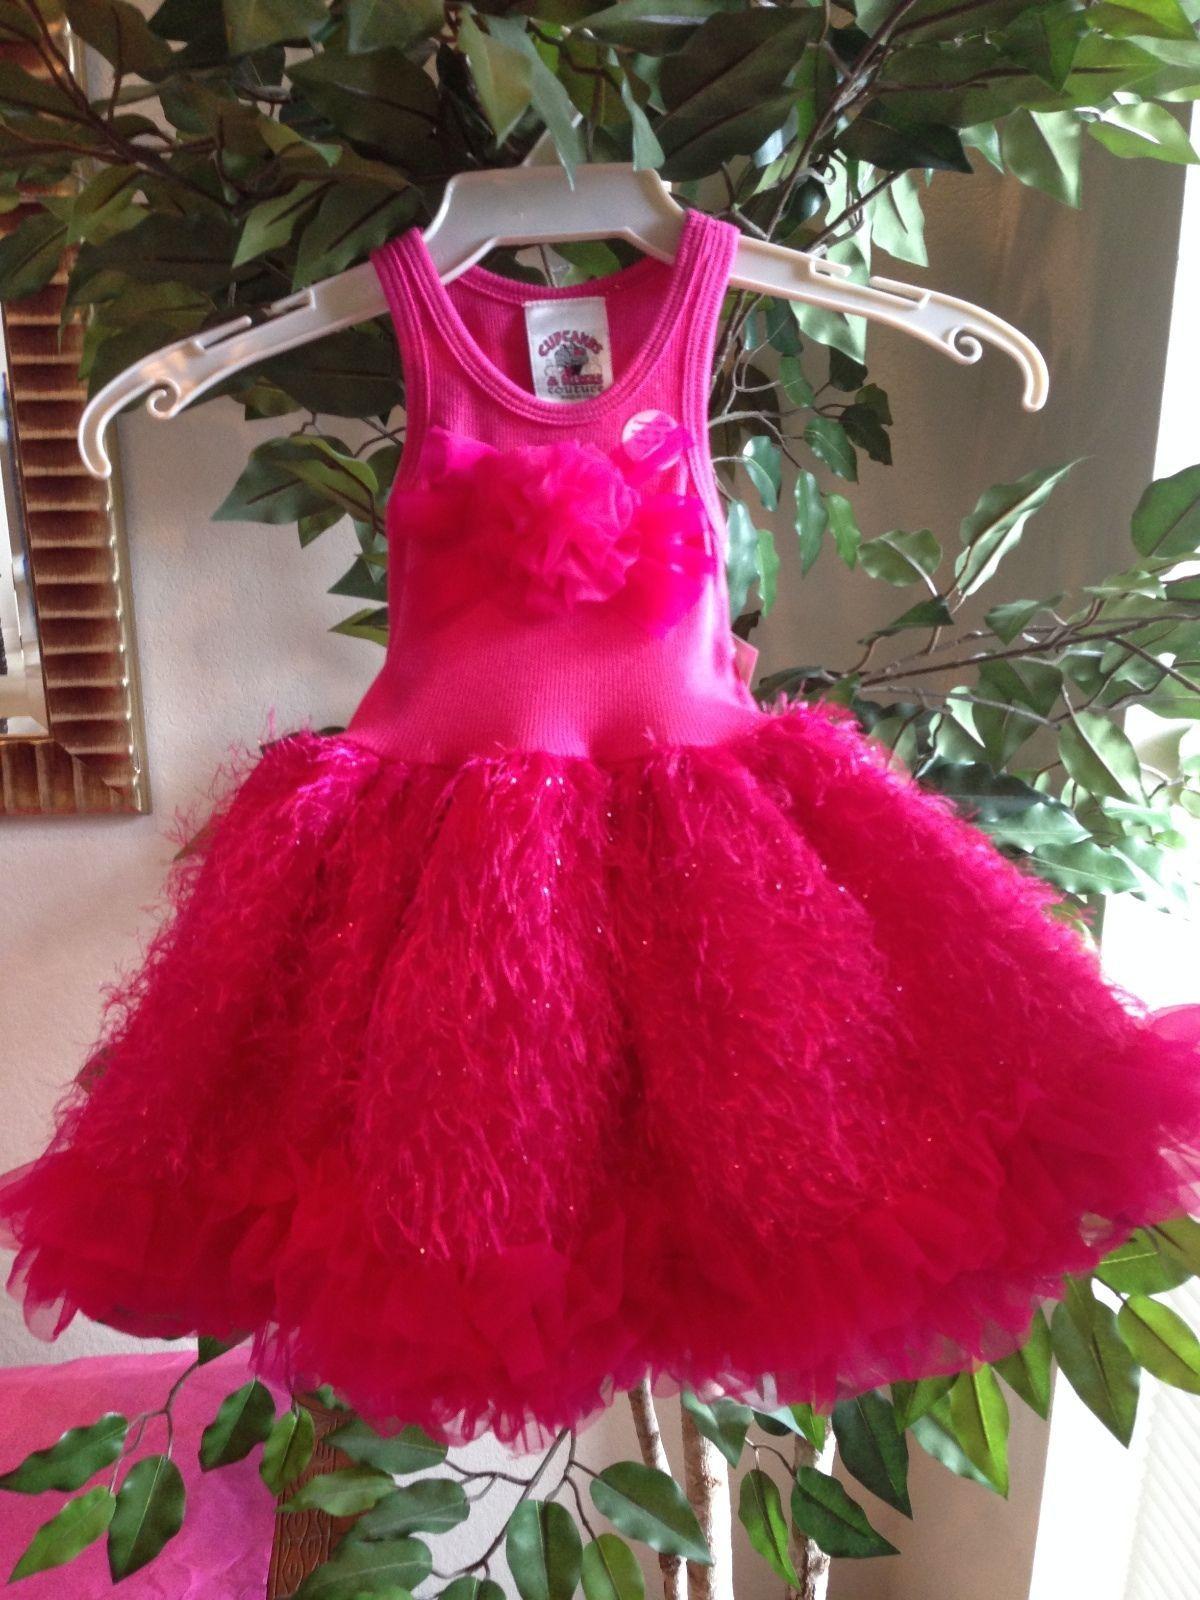 Image 2 of Posh Sparkly Fuchsia Eyelash Chiffon Pink Tutu Dress, 6M-5/6 USA Cupcakes Kisses